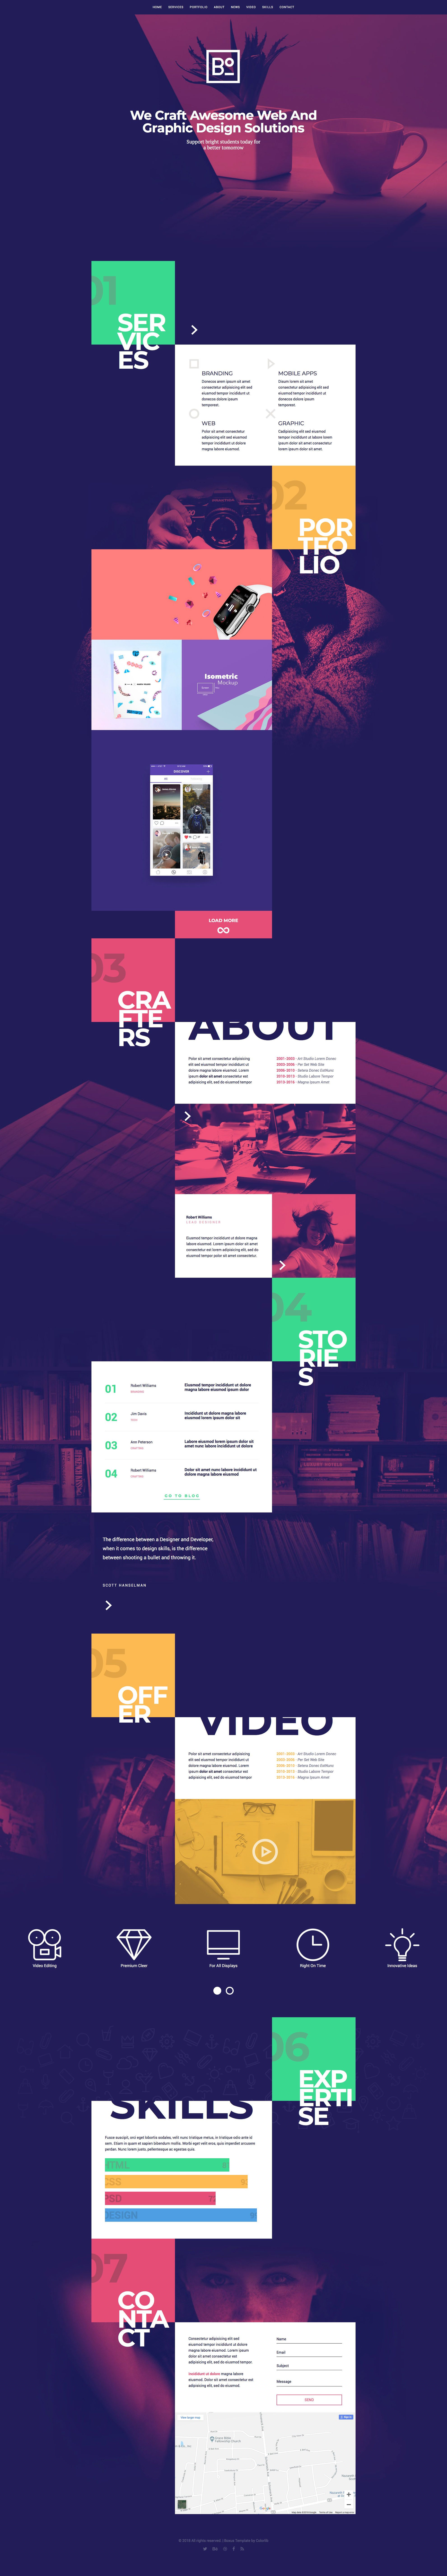 Boxus Free responsive HTML5 Bootstrap Portfolio template